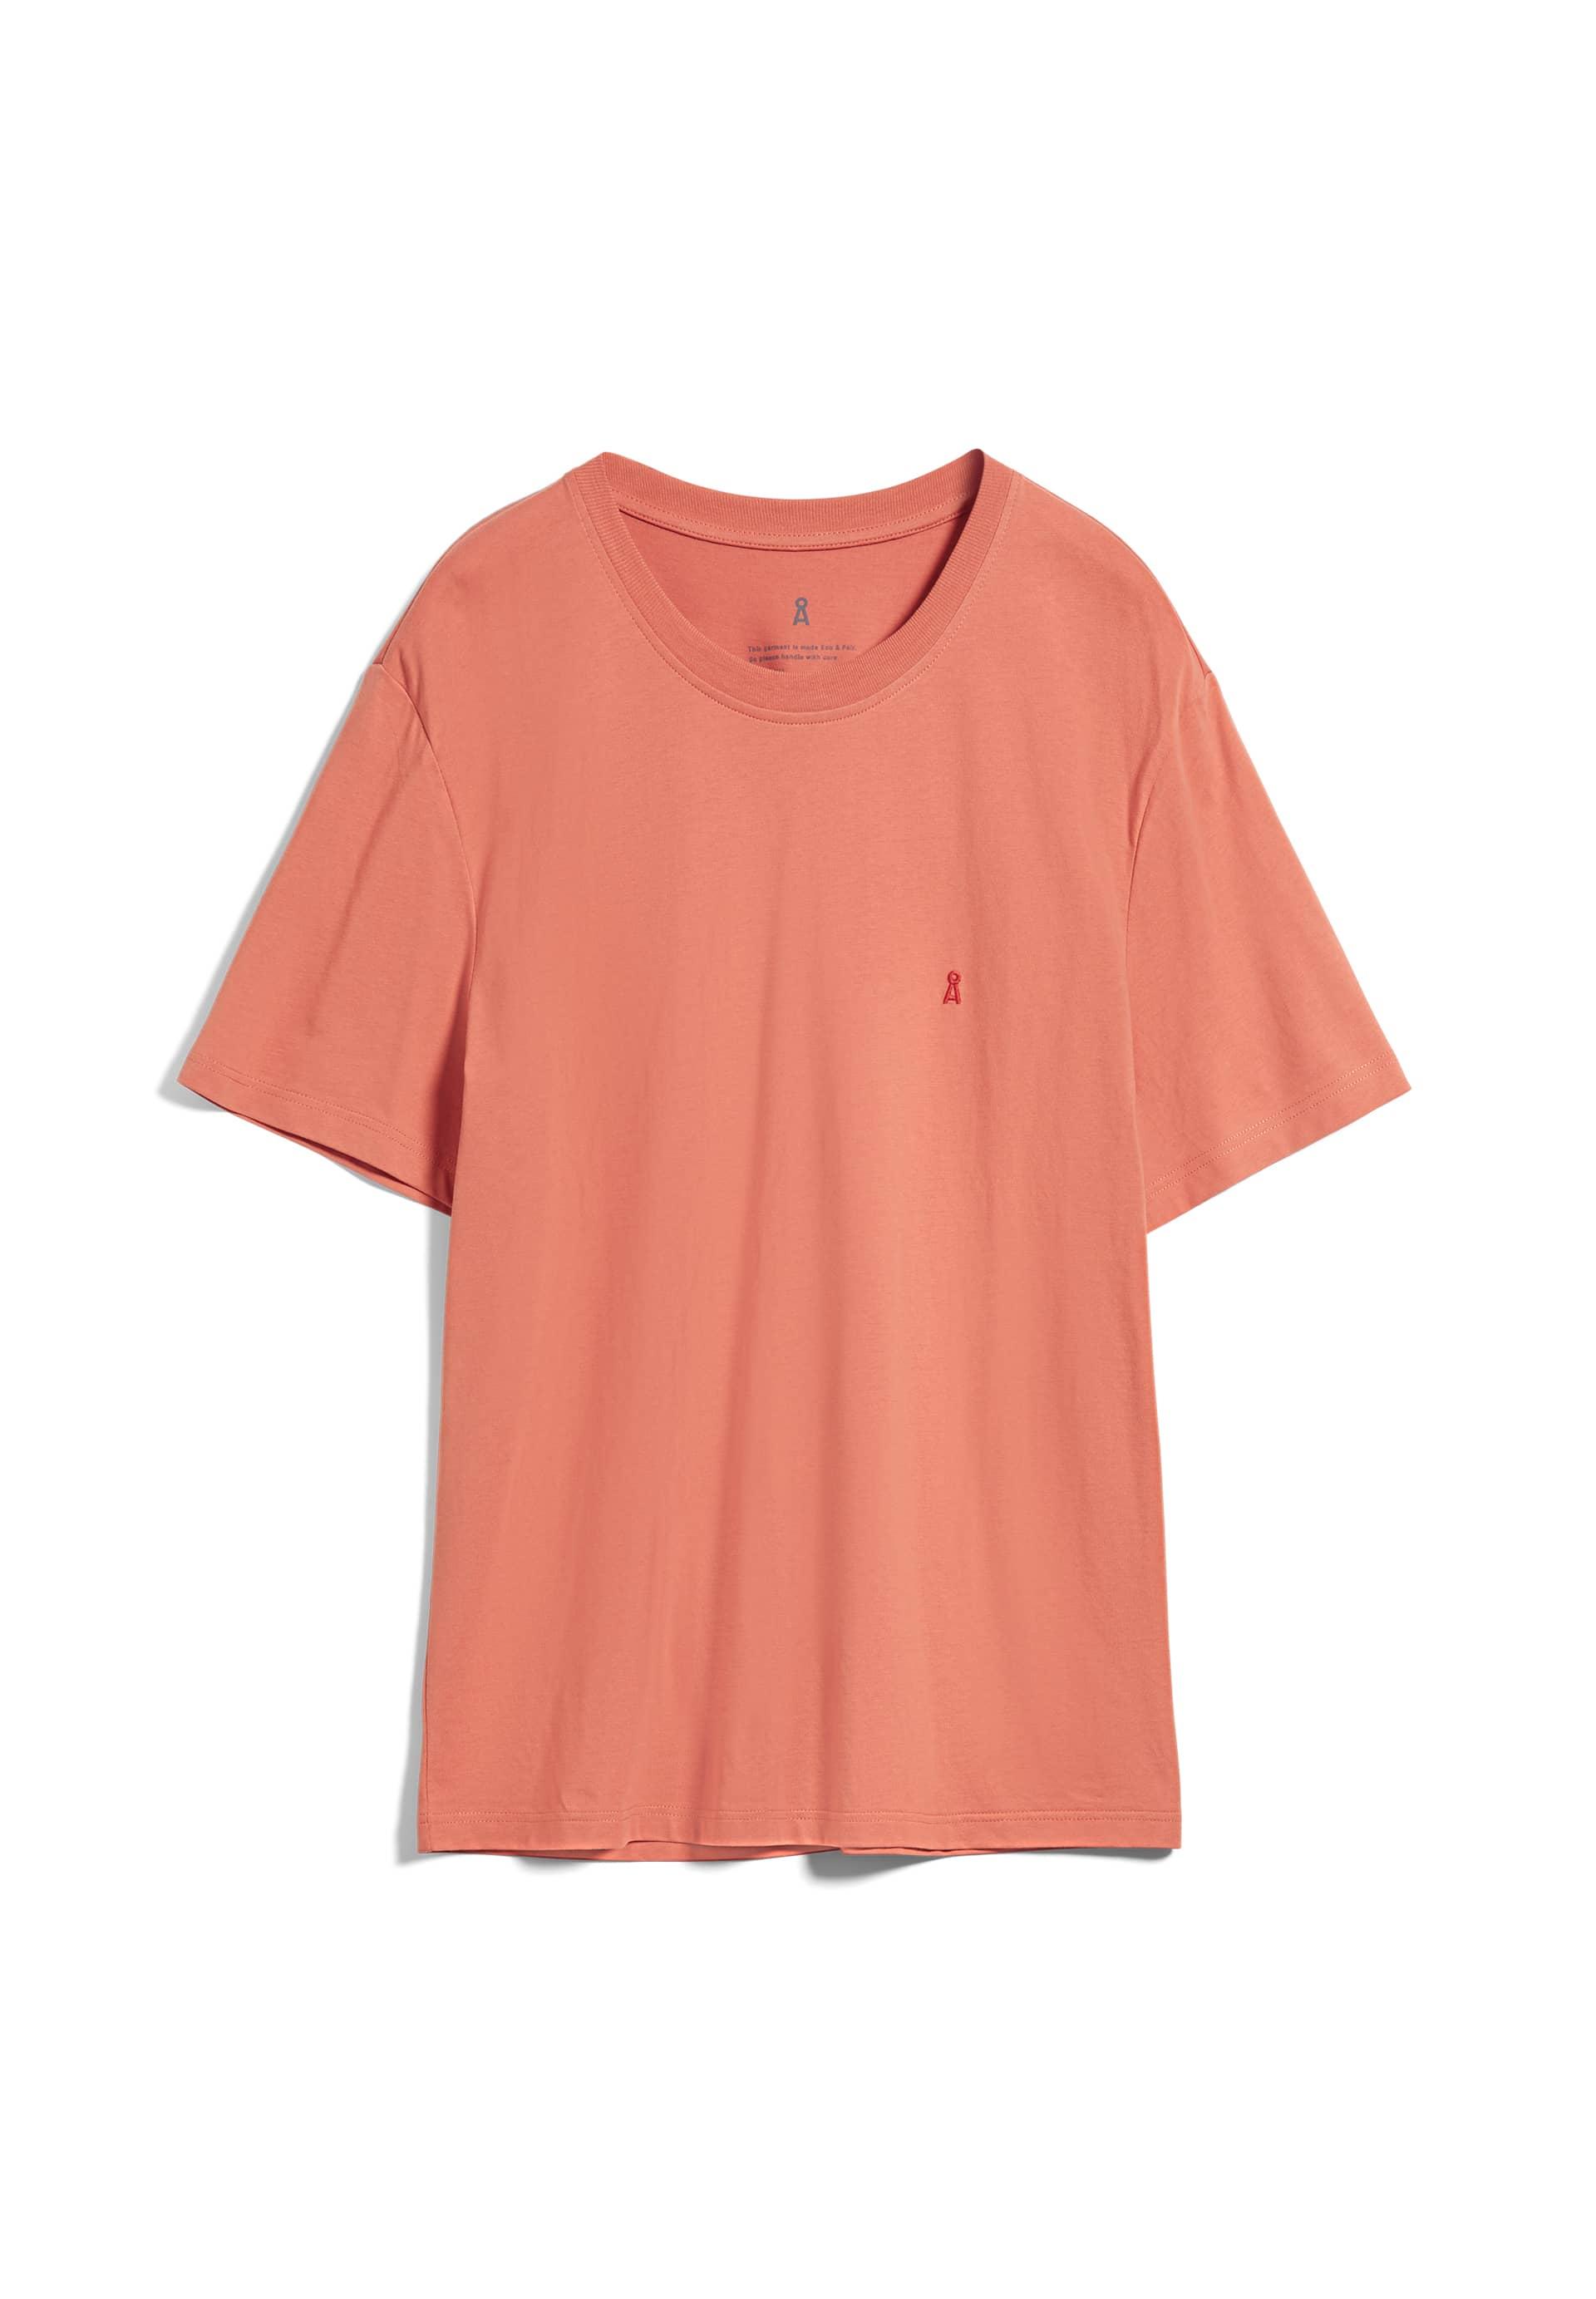 AADO T-Shirt made of Organic Cotton